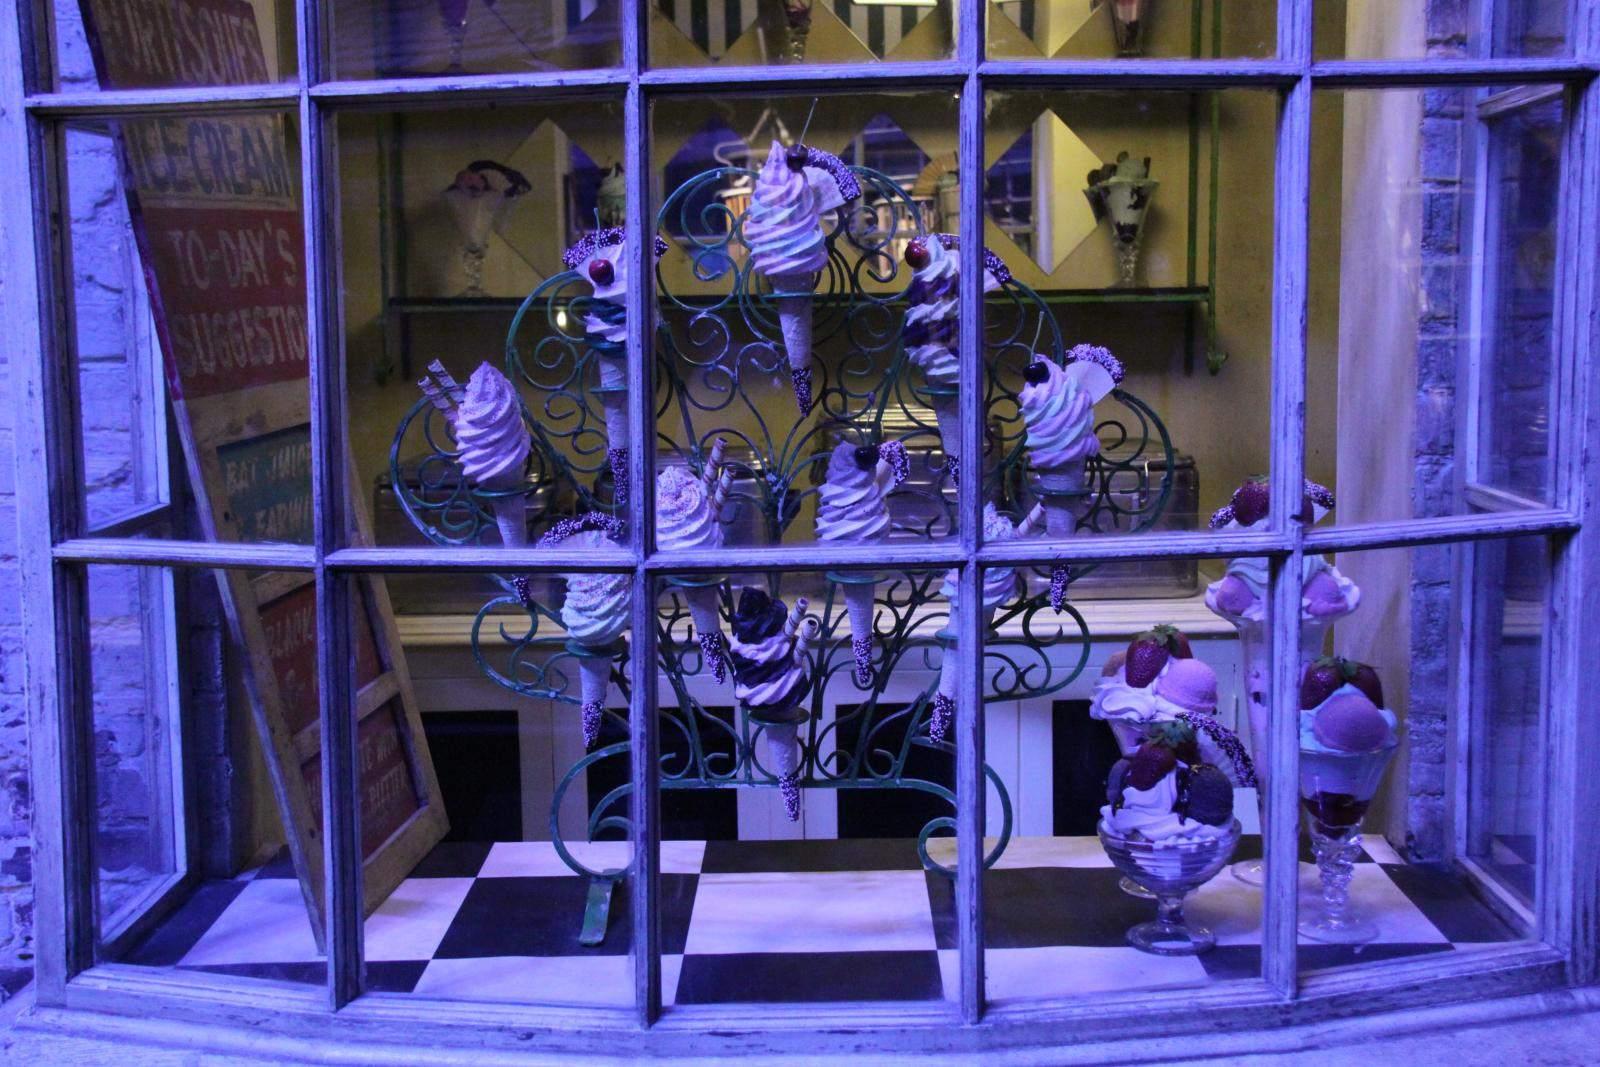 making harry potter5 The Making of Harry Potter, Warner Bros Studio London